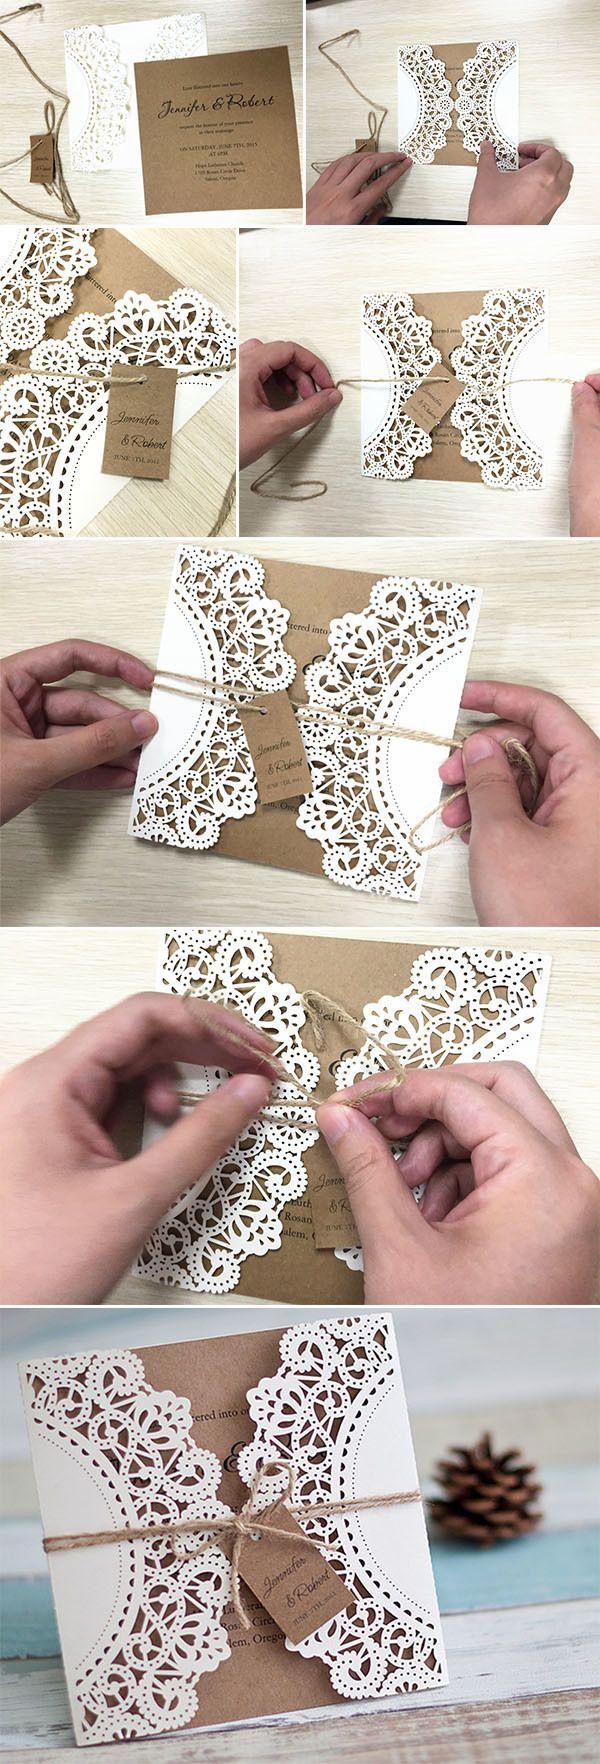 27 DIY Wedding Ideas That Will Save You A FORTUNE On Your Big Day. - http://www.lifebuzz.com/diy-wedding/